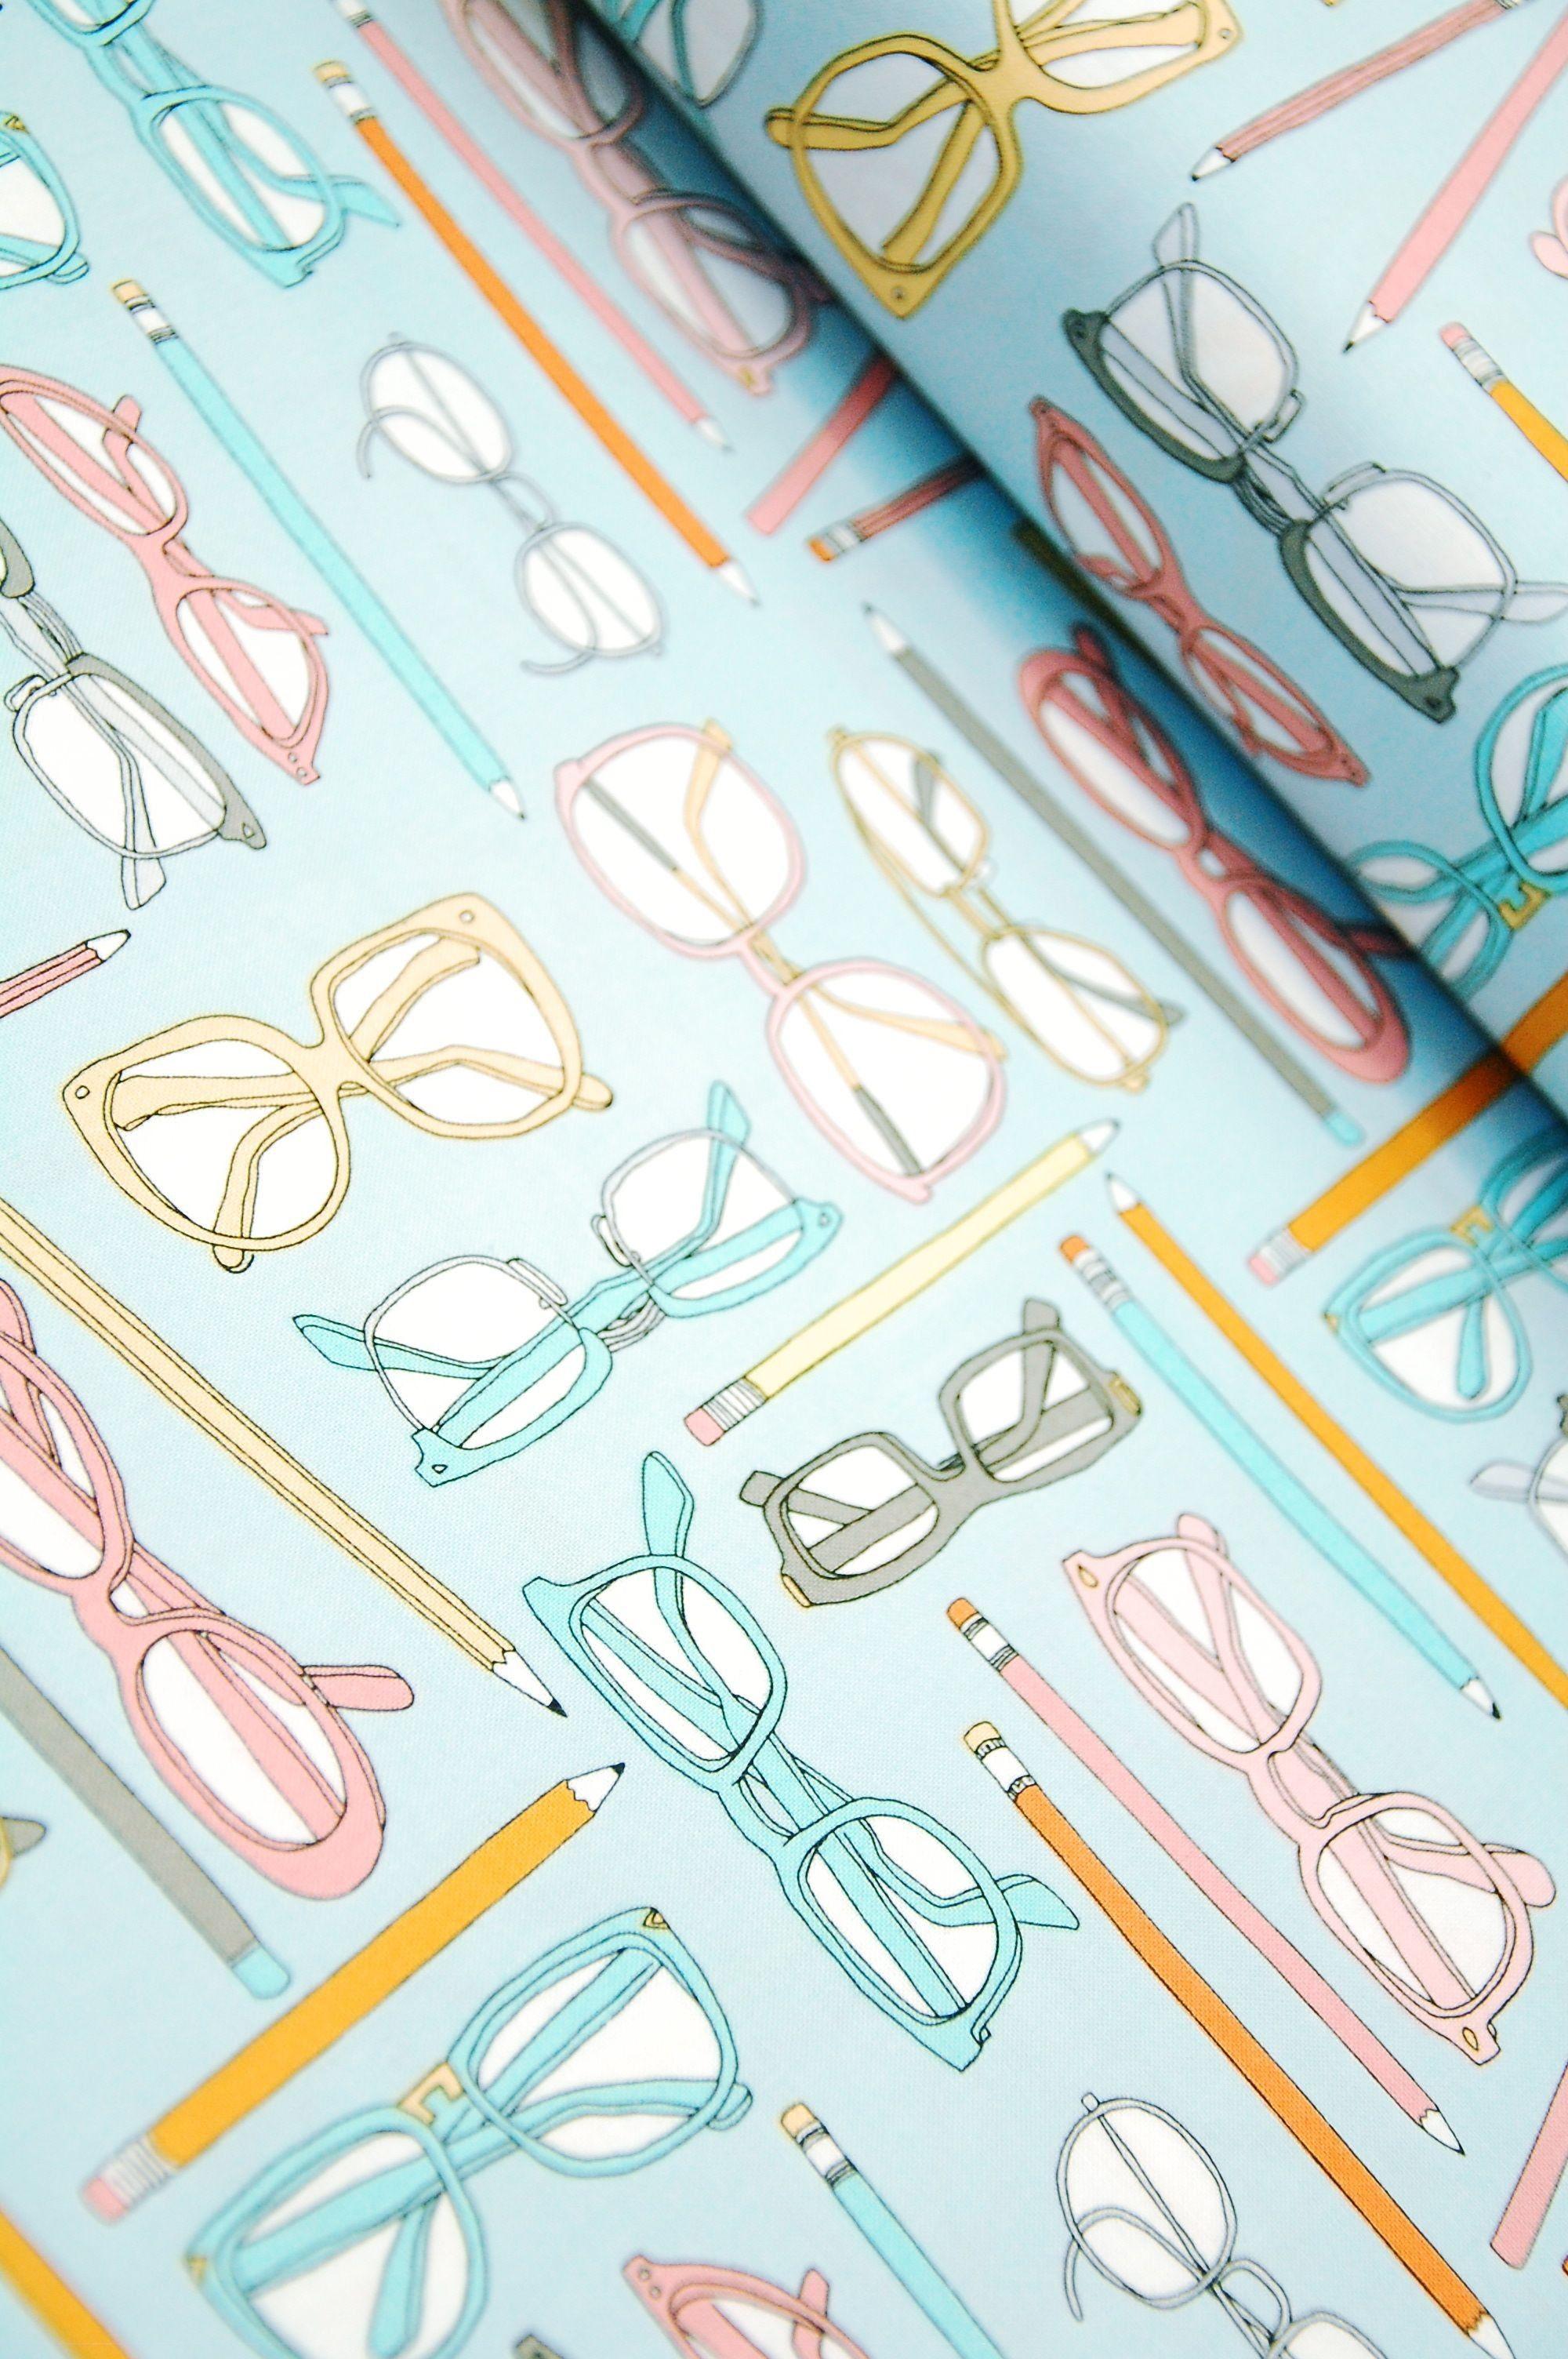 LOVE this print! Pencils & Spectacles - Type - Julia Rothman - Windham Fabrics